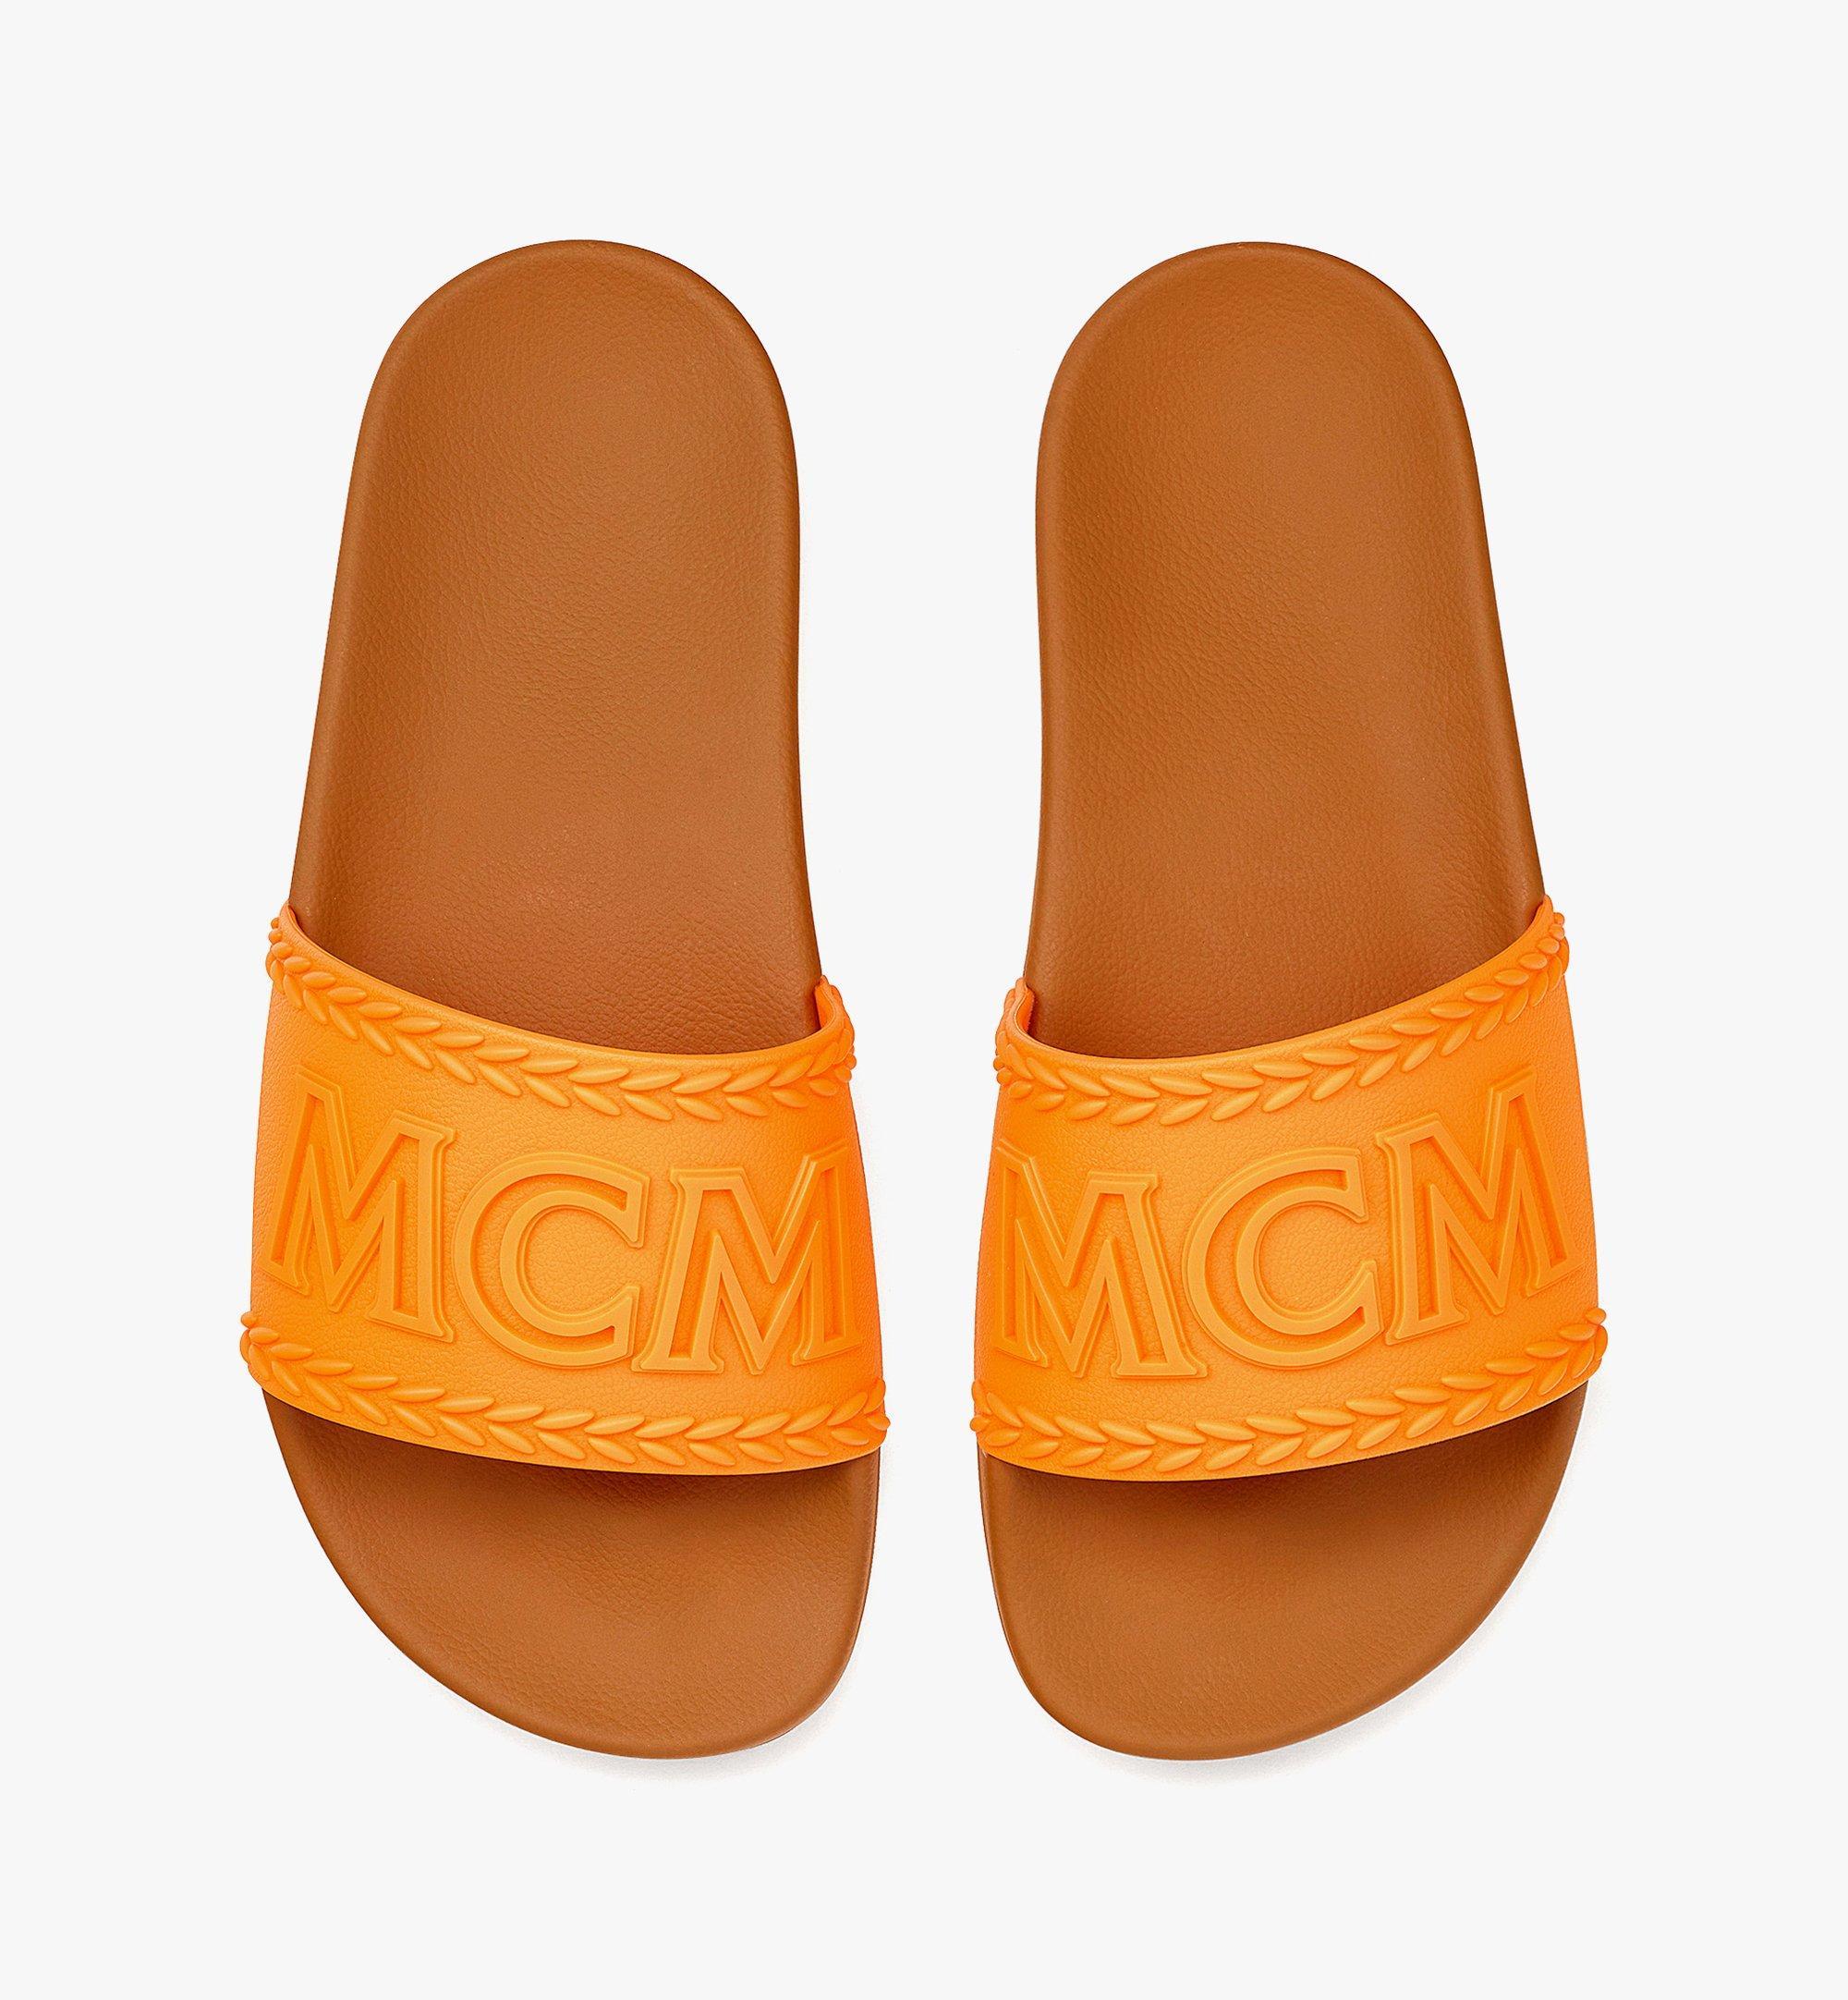 MCM 女士 Big Logo 橡膠拖鞋 Orange MESBSMM15O9036 更多視圖 4